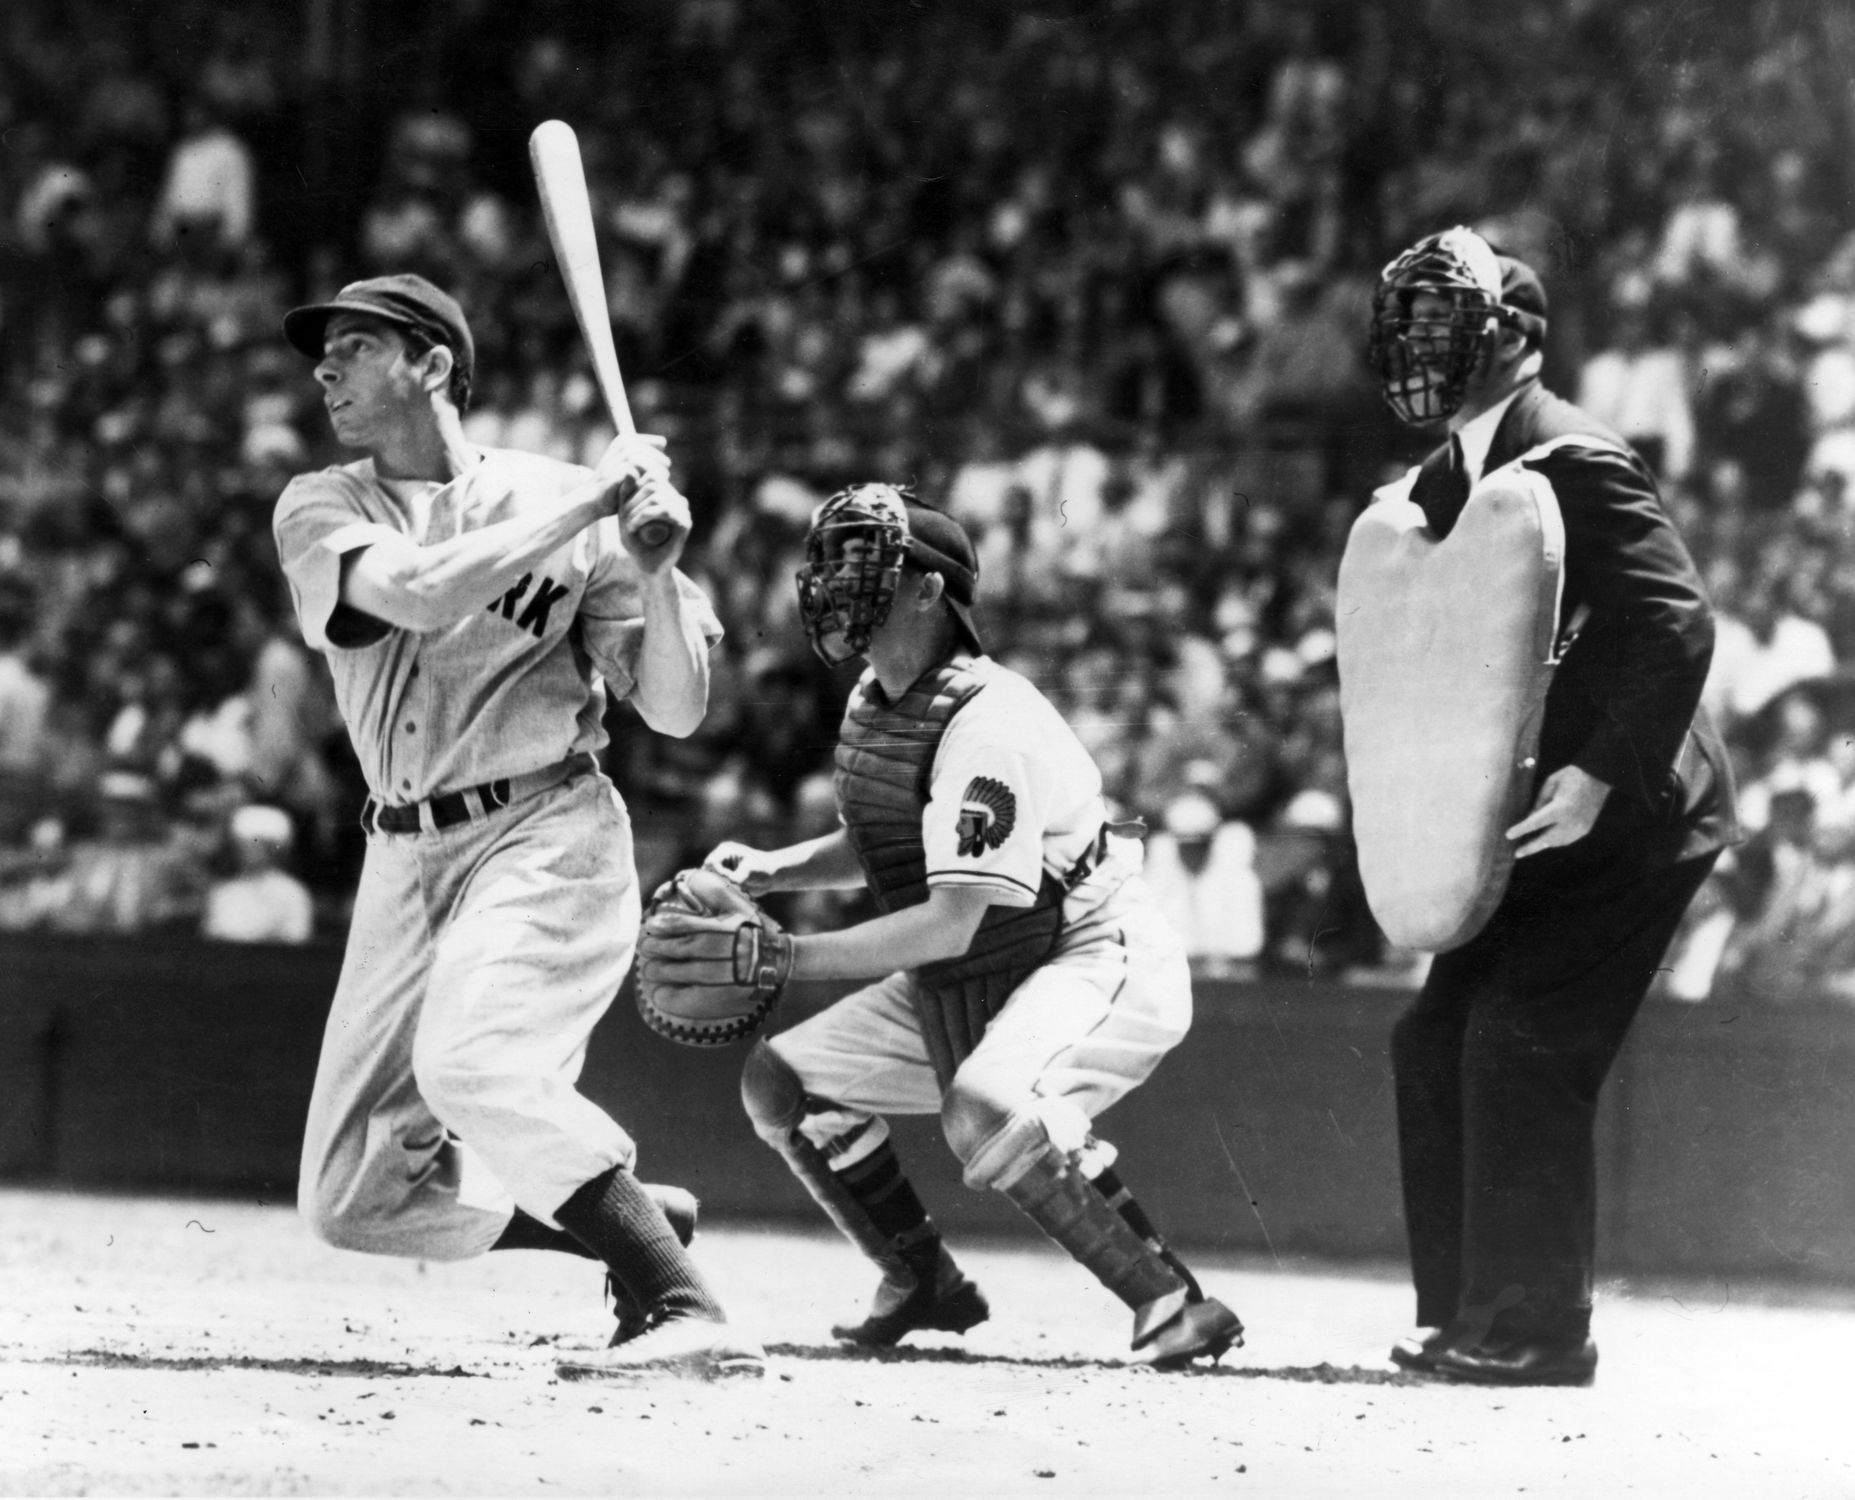 DiMaggio singles to start hitting streak   Baseball Hall ...